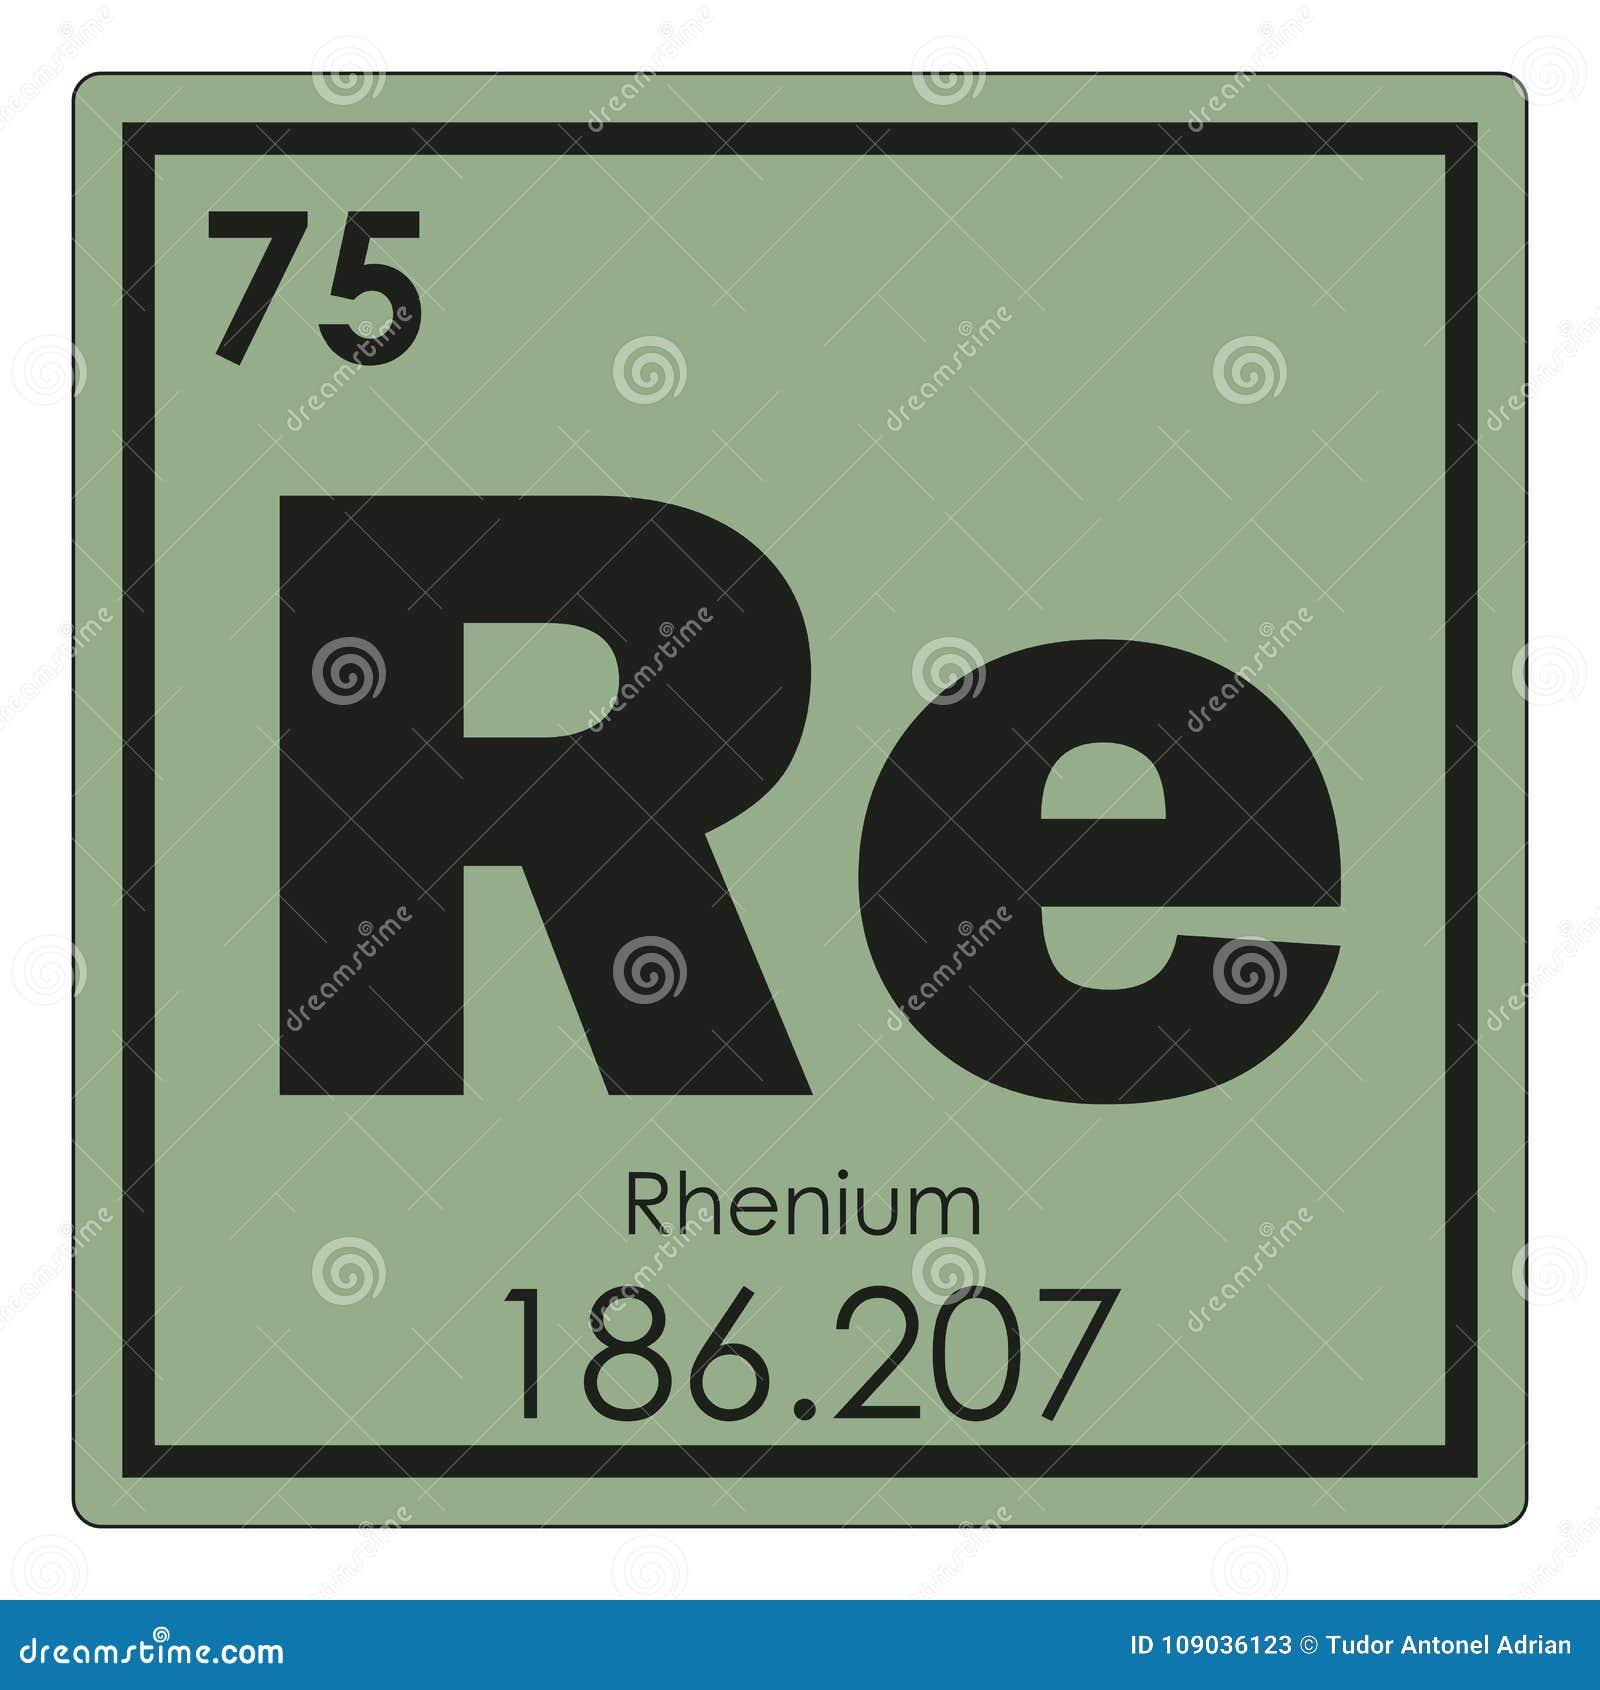 Rhenium Chemical Element Stock Illustration Illustration Of